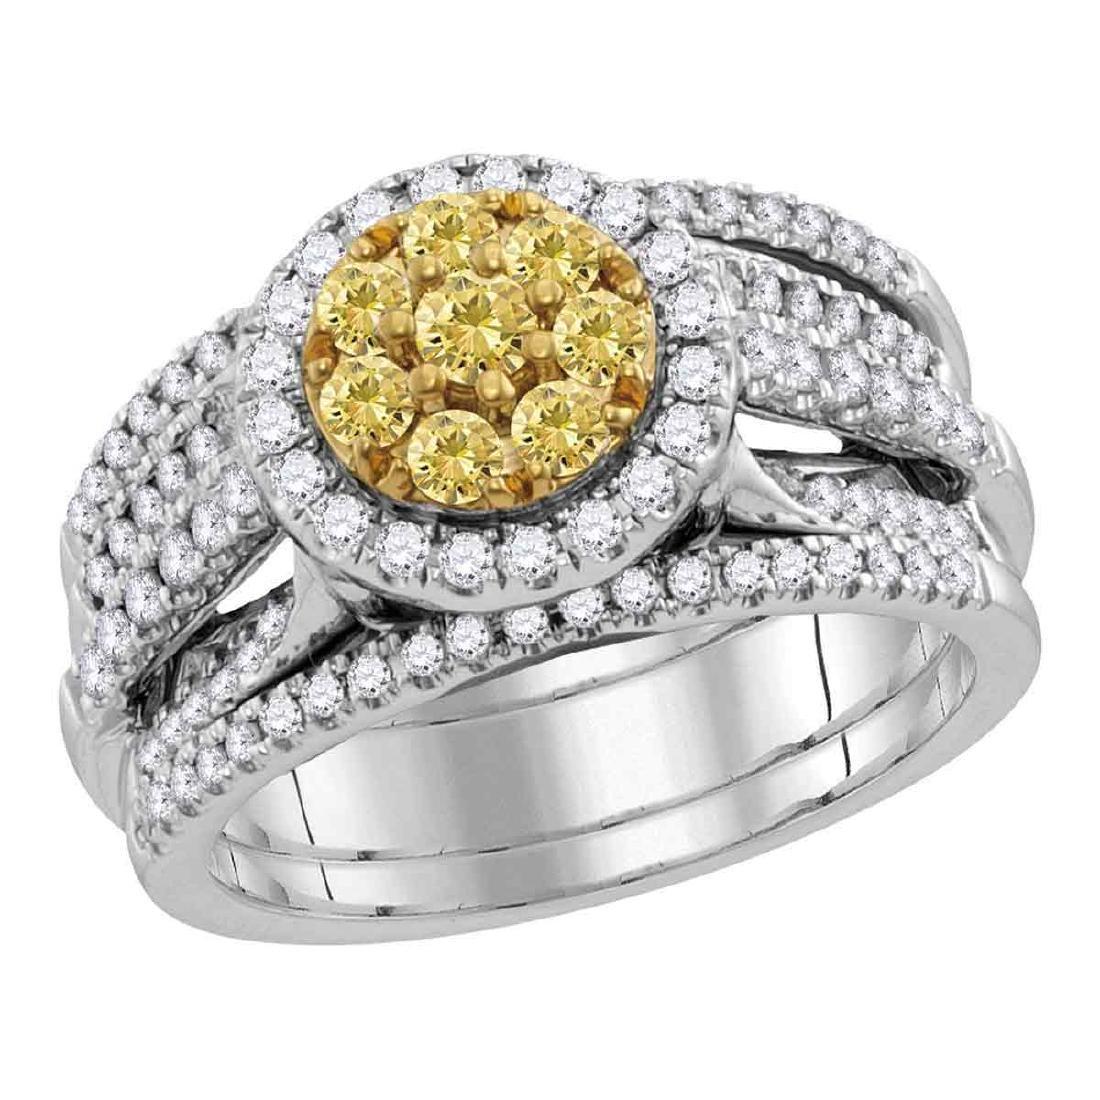 1.05 CTW Yellow Diamond Bridal Engagement Ring 14KT